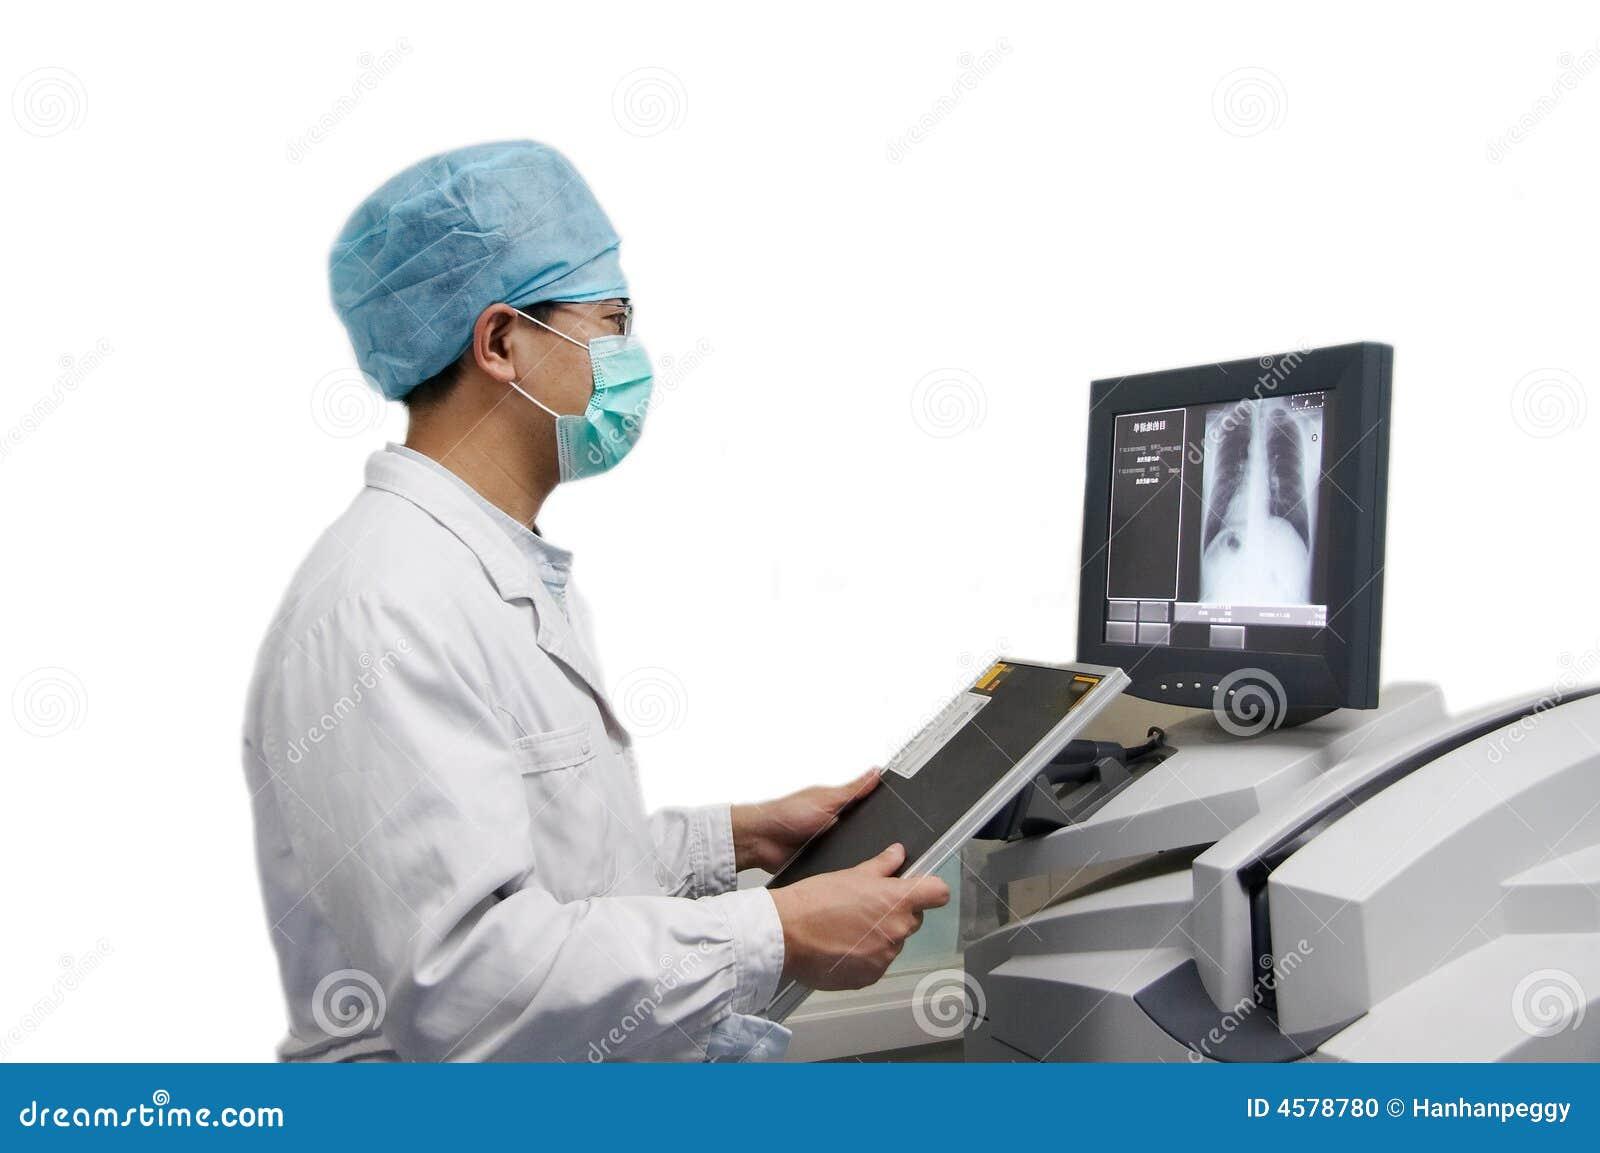 Ray Machine Clipart Doctor and x-ray computerXray Machine Clipart